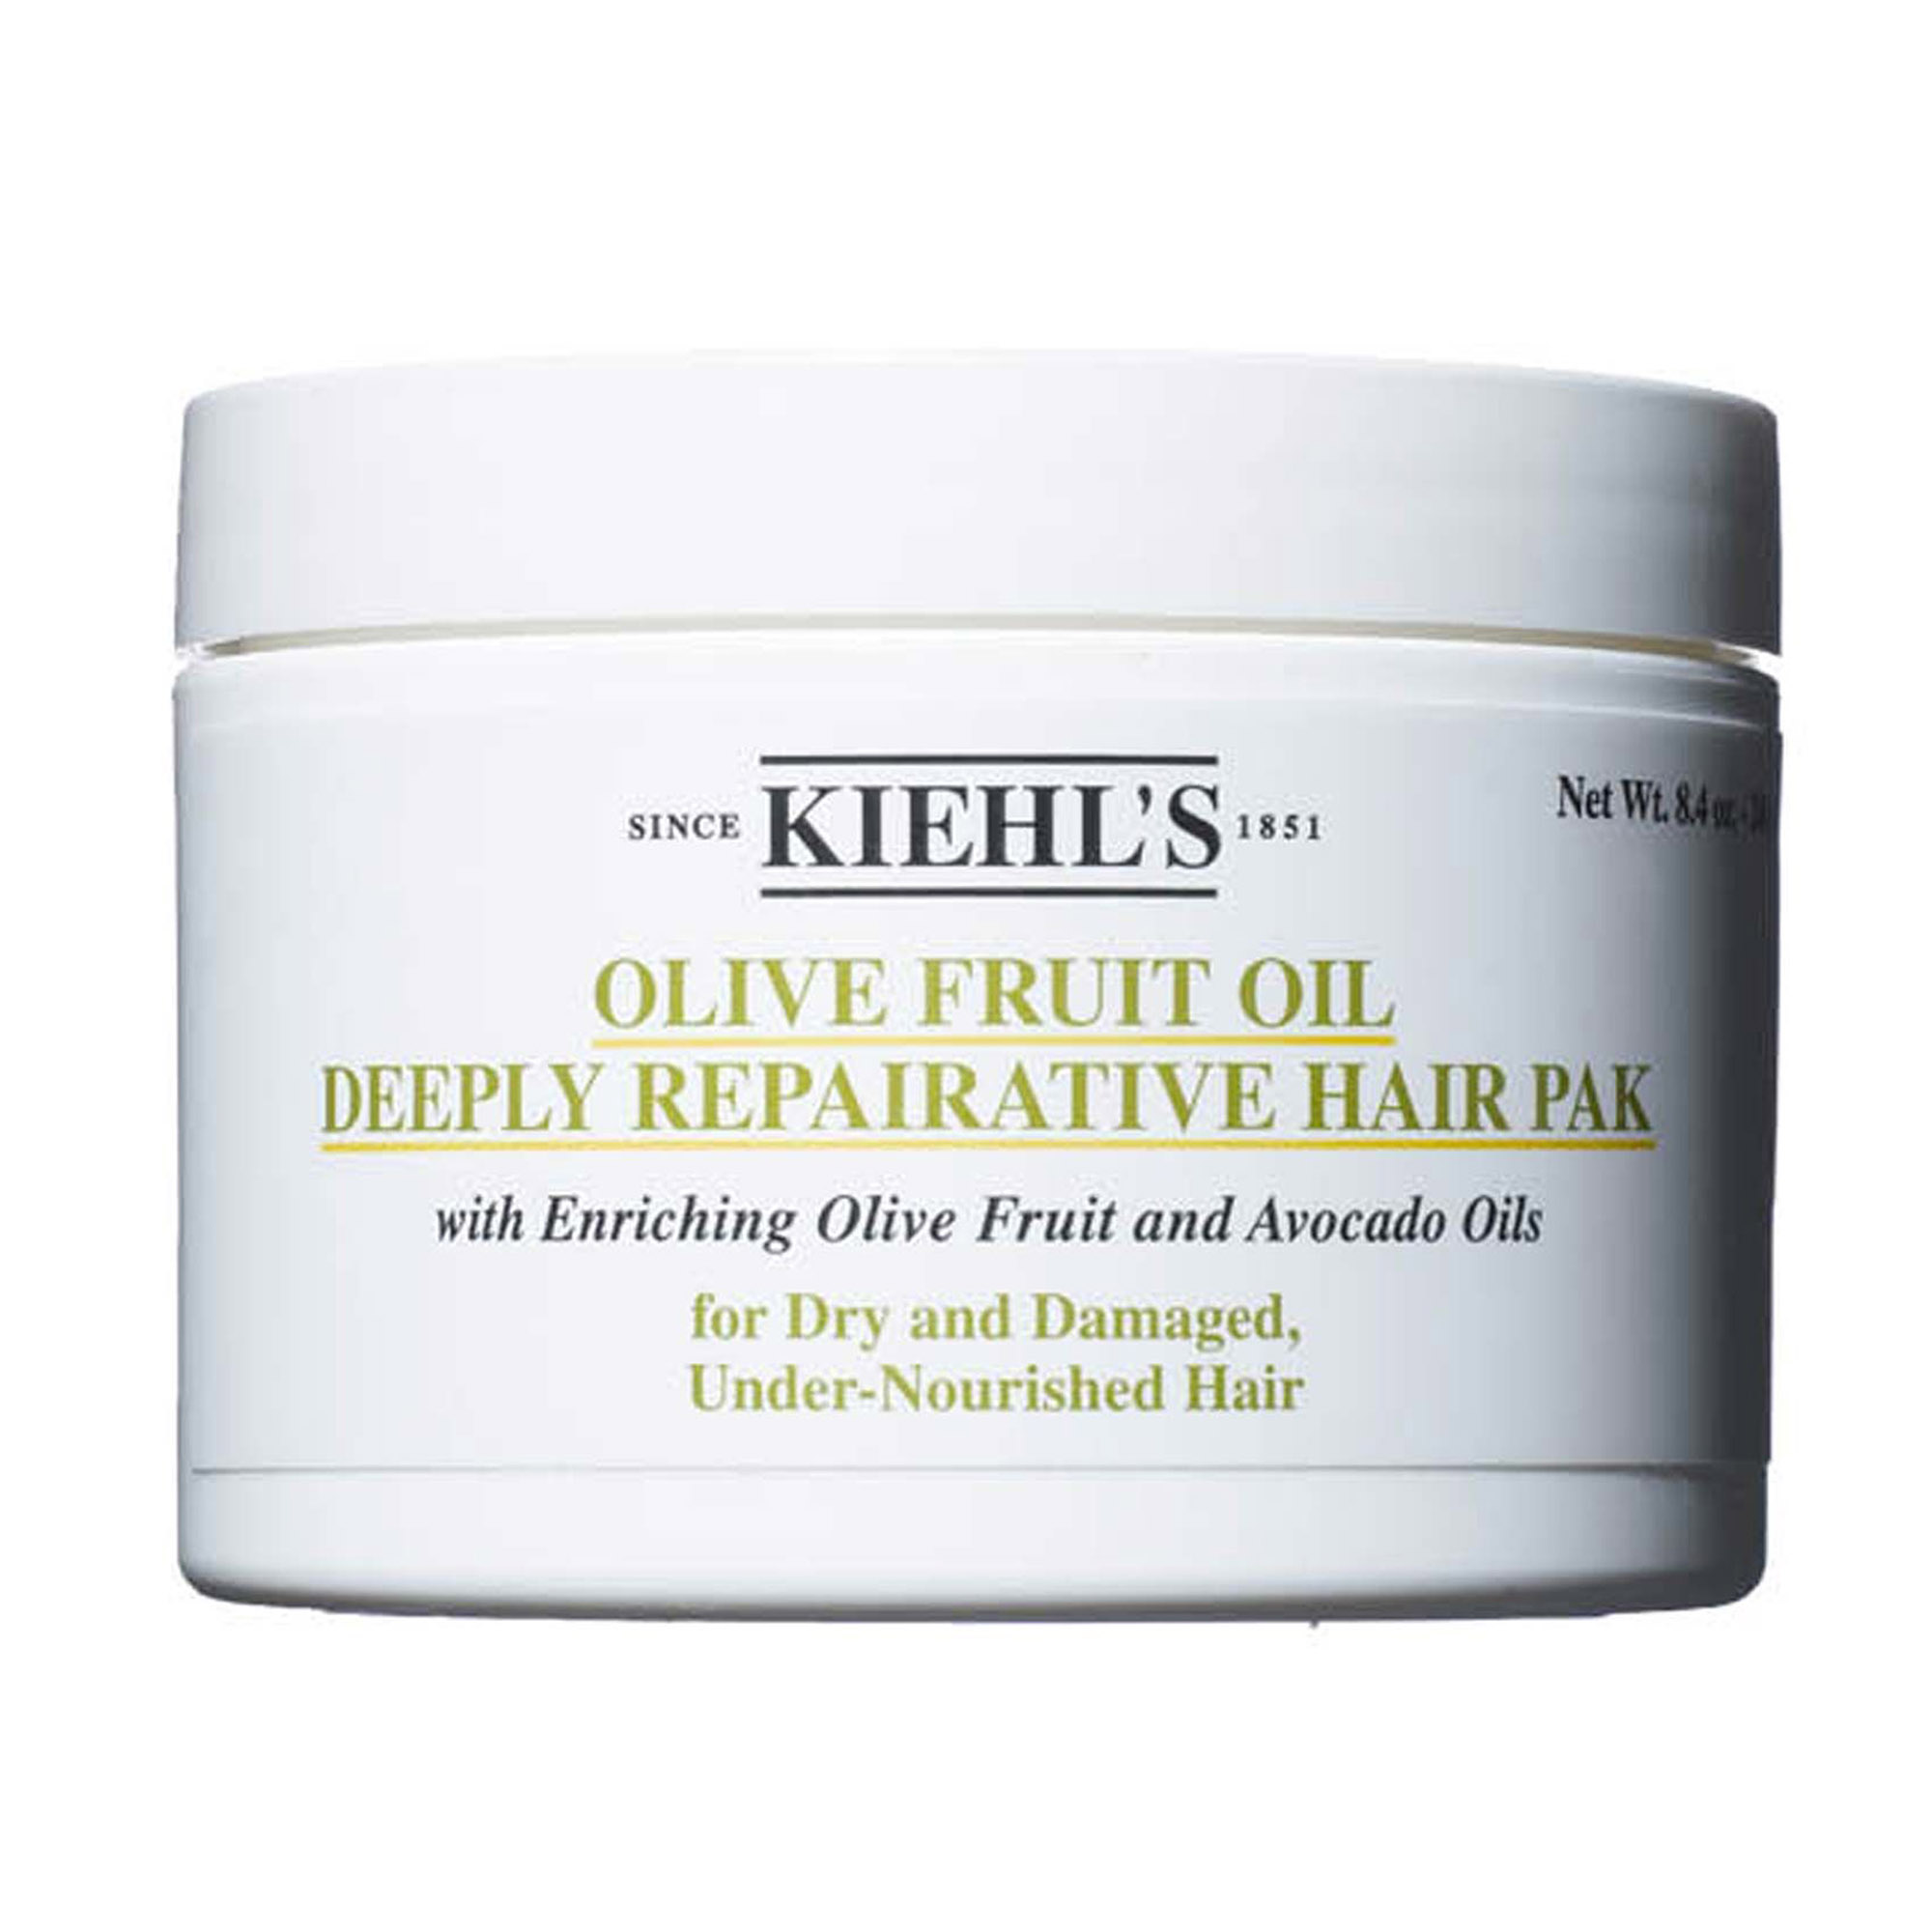 OLIVE FRUIT OIL DEEPLY REPAIRATIVE HAIR PAK 250ML